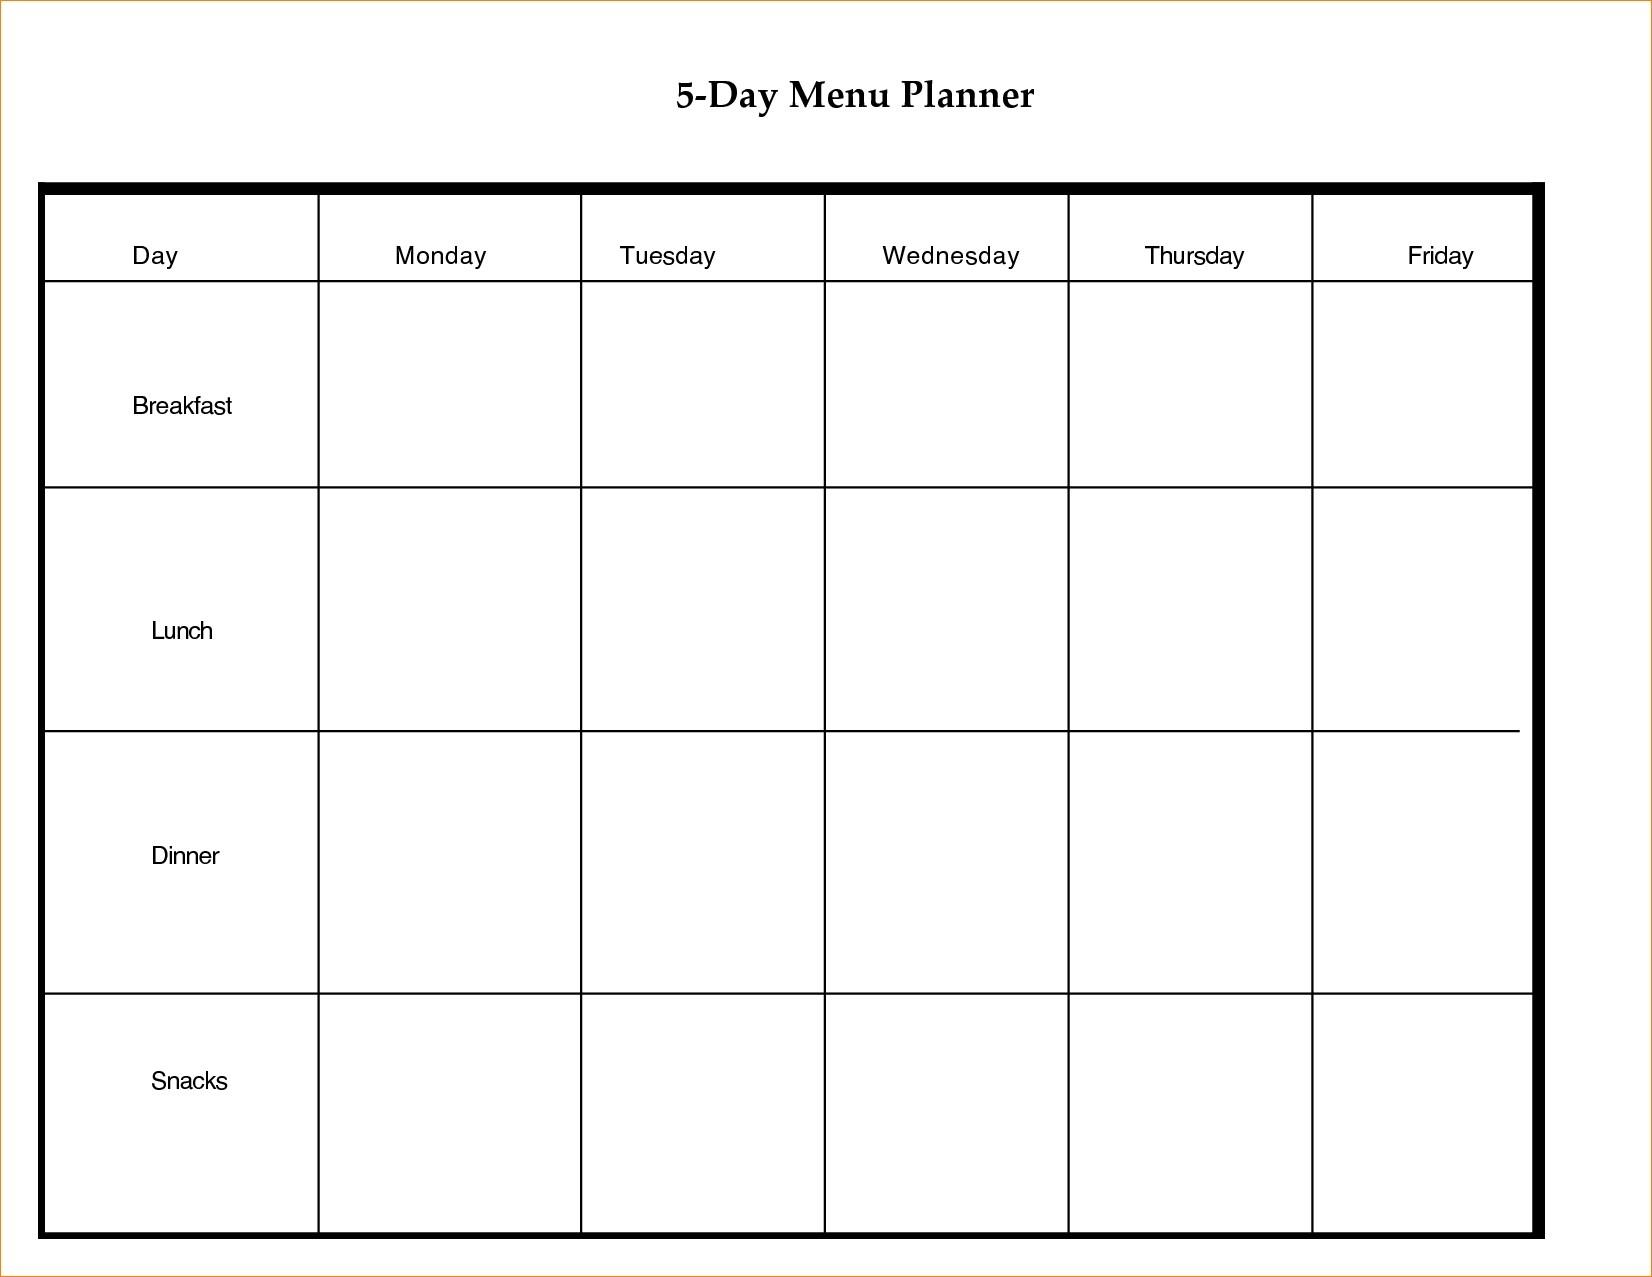 Printable 5 Day Calendar Blank Calendar Template 5 Day Week 0 8 With with 5 Day Week Calendar Printable